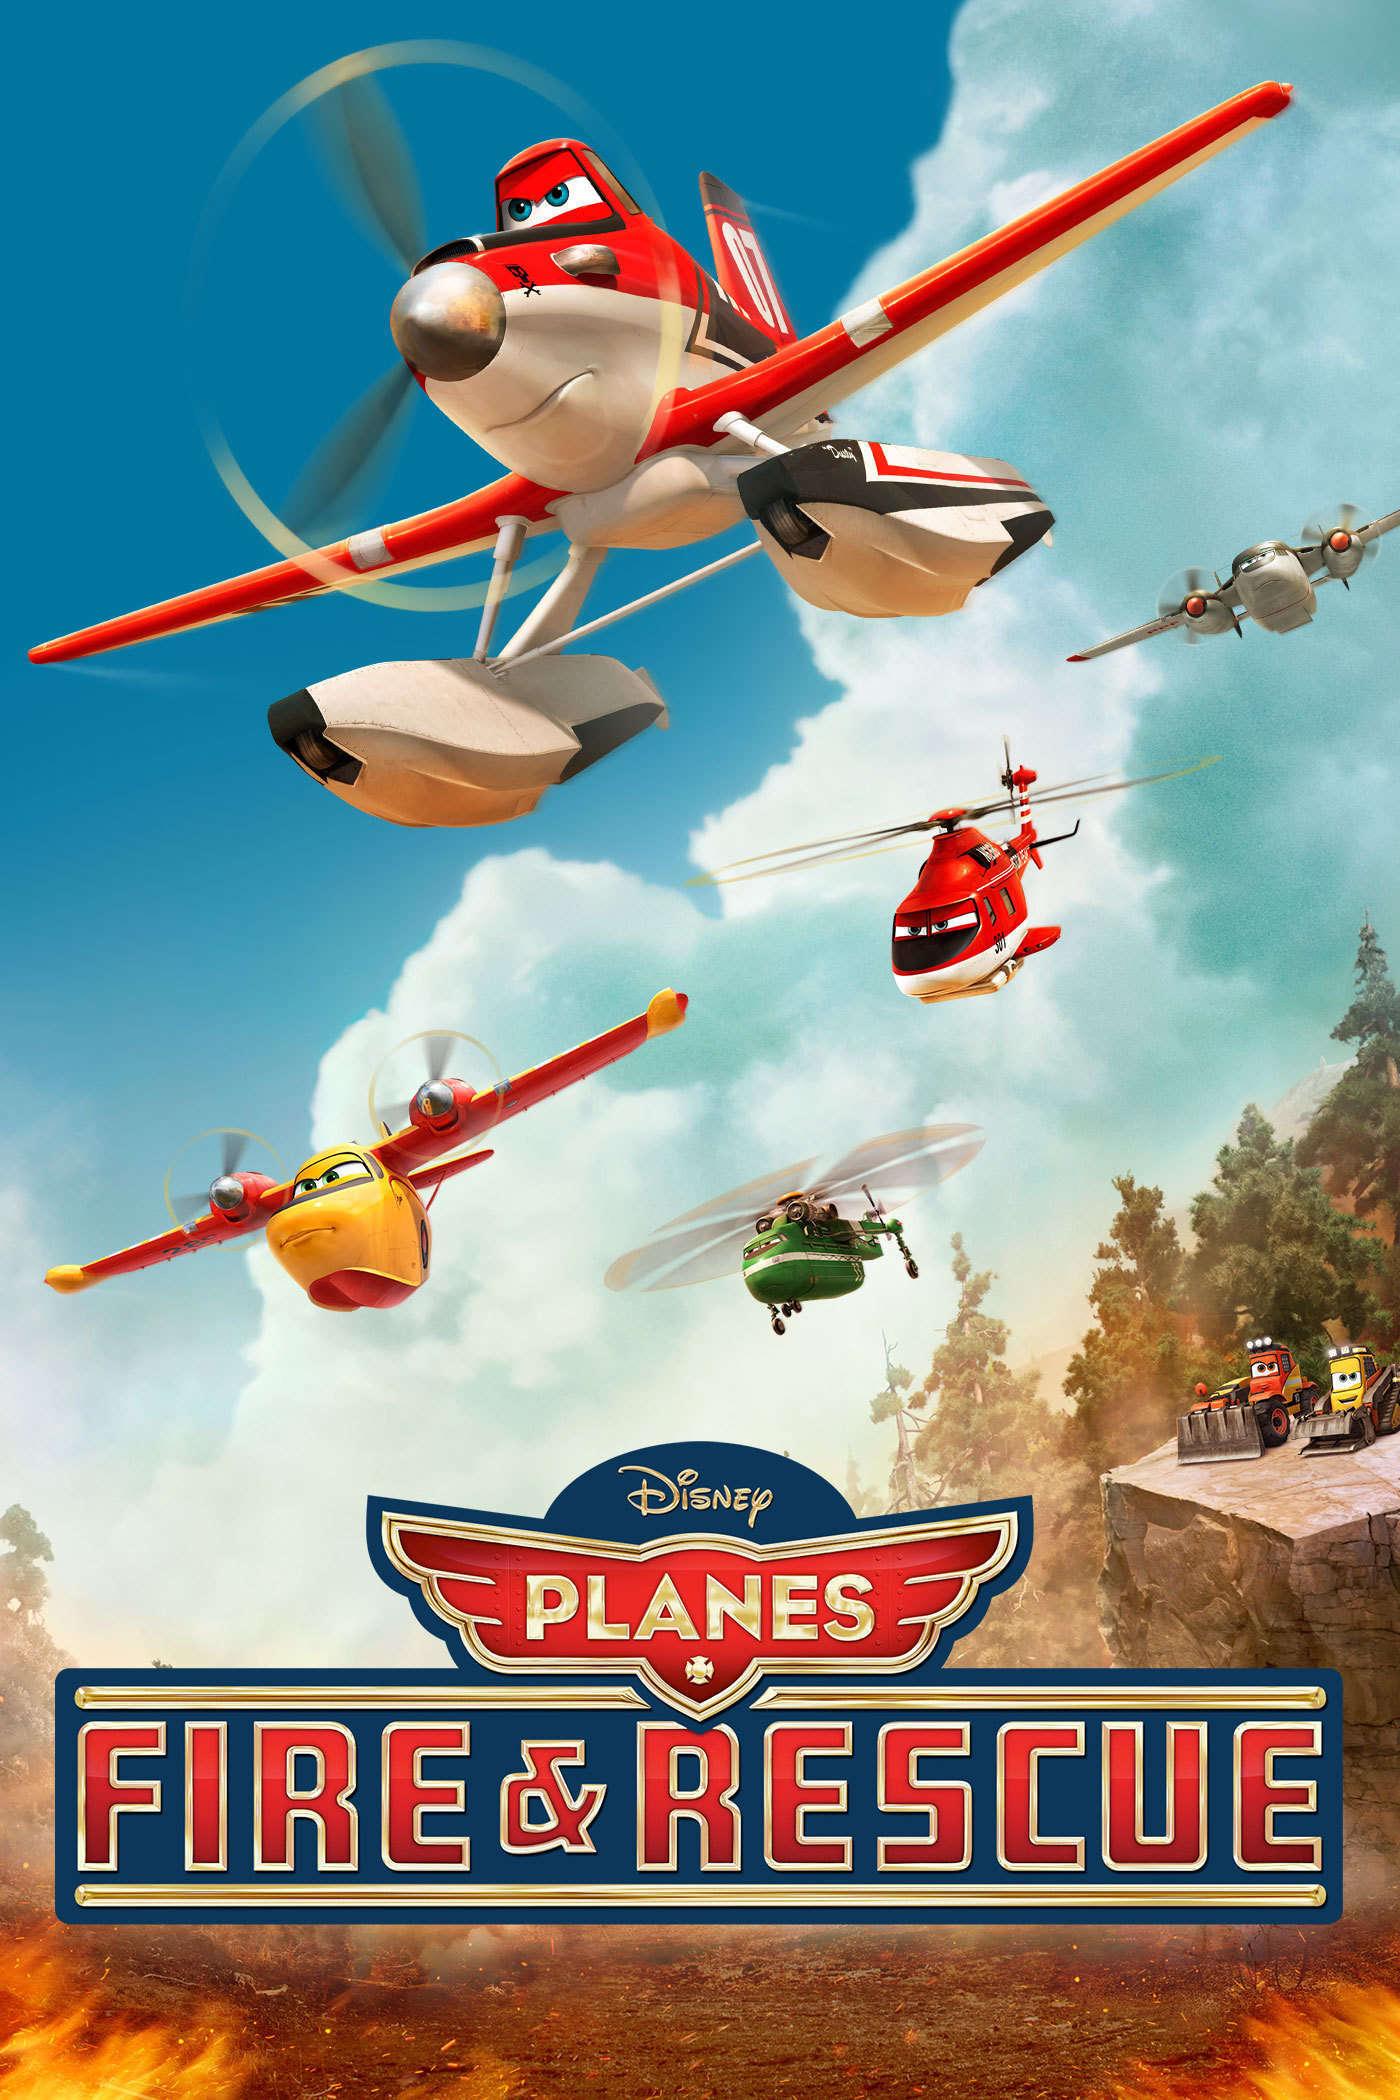 Planes Fire And Rescue 2014 720p BluRay x264-x0r